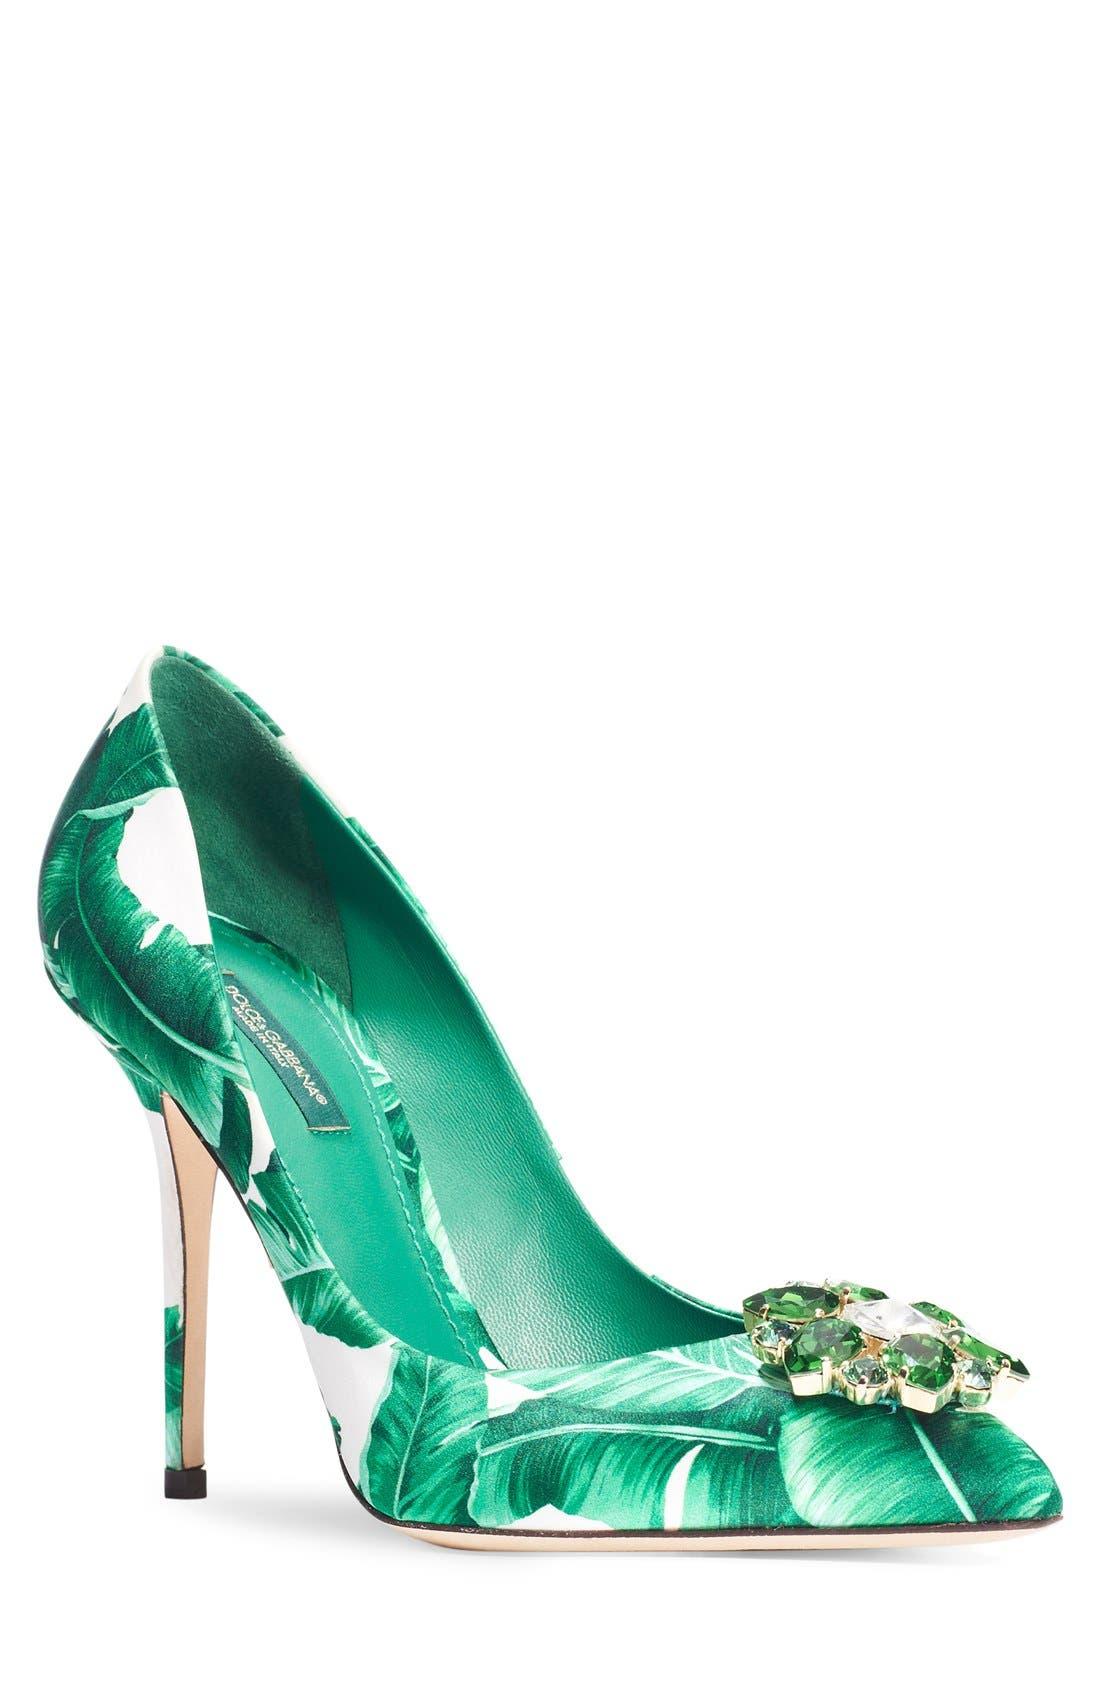 Alternate Image 1 Selected - Dolce&Gabbana Banana Leaf Pointy Toe Pump (Women)